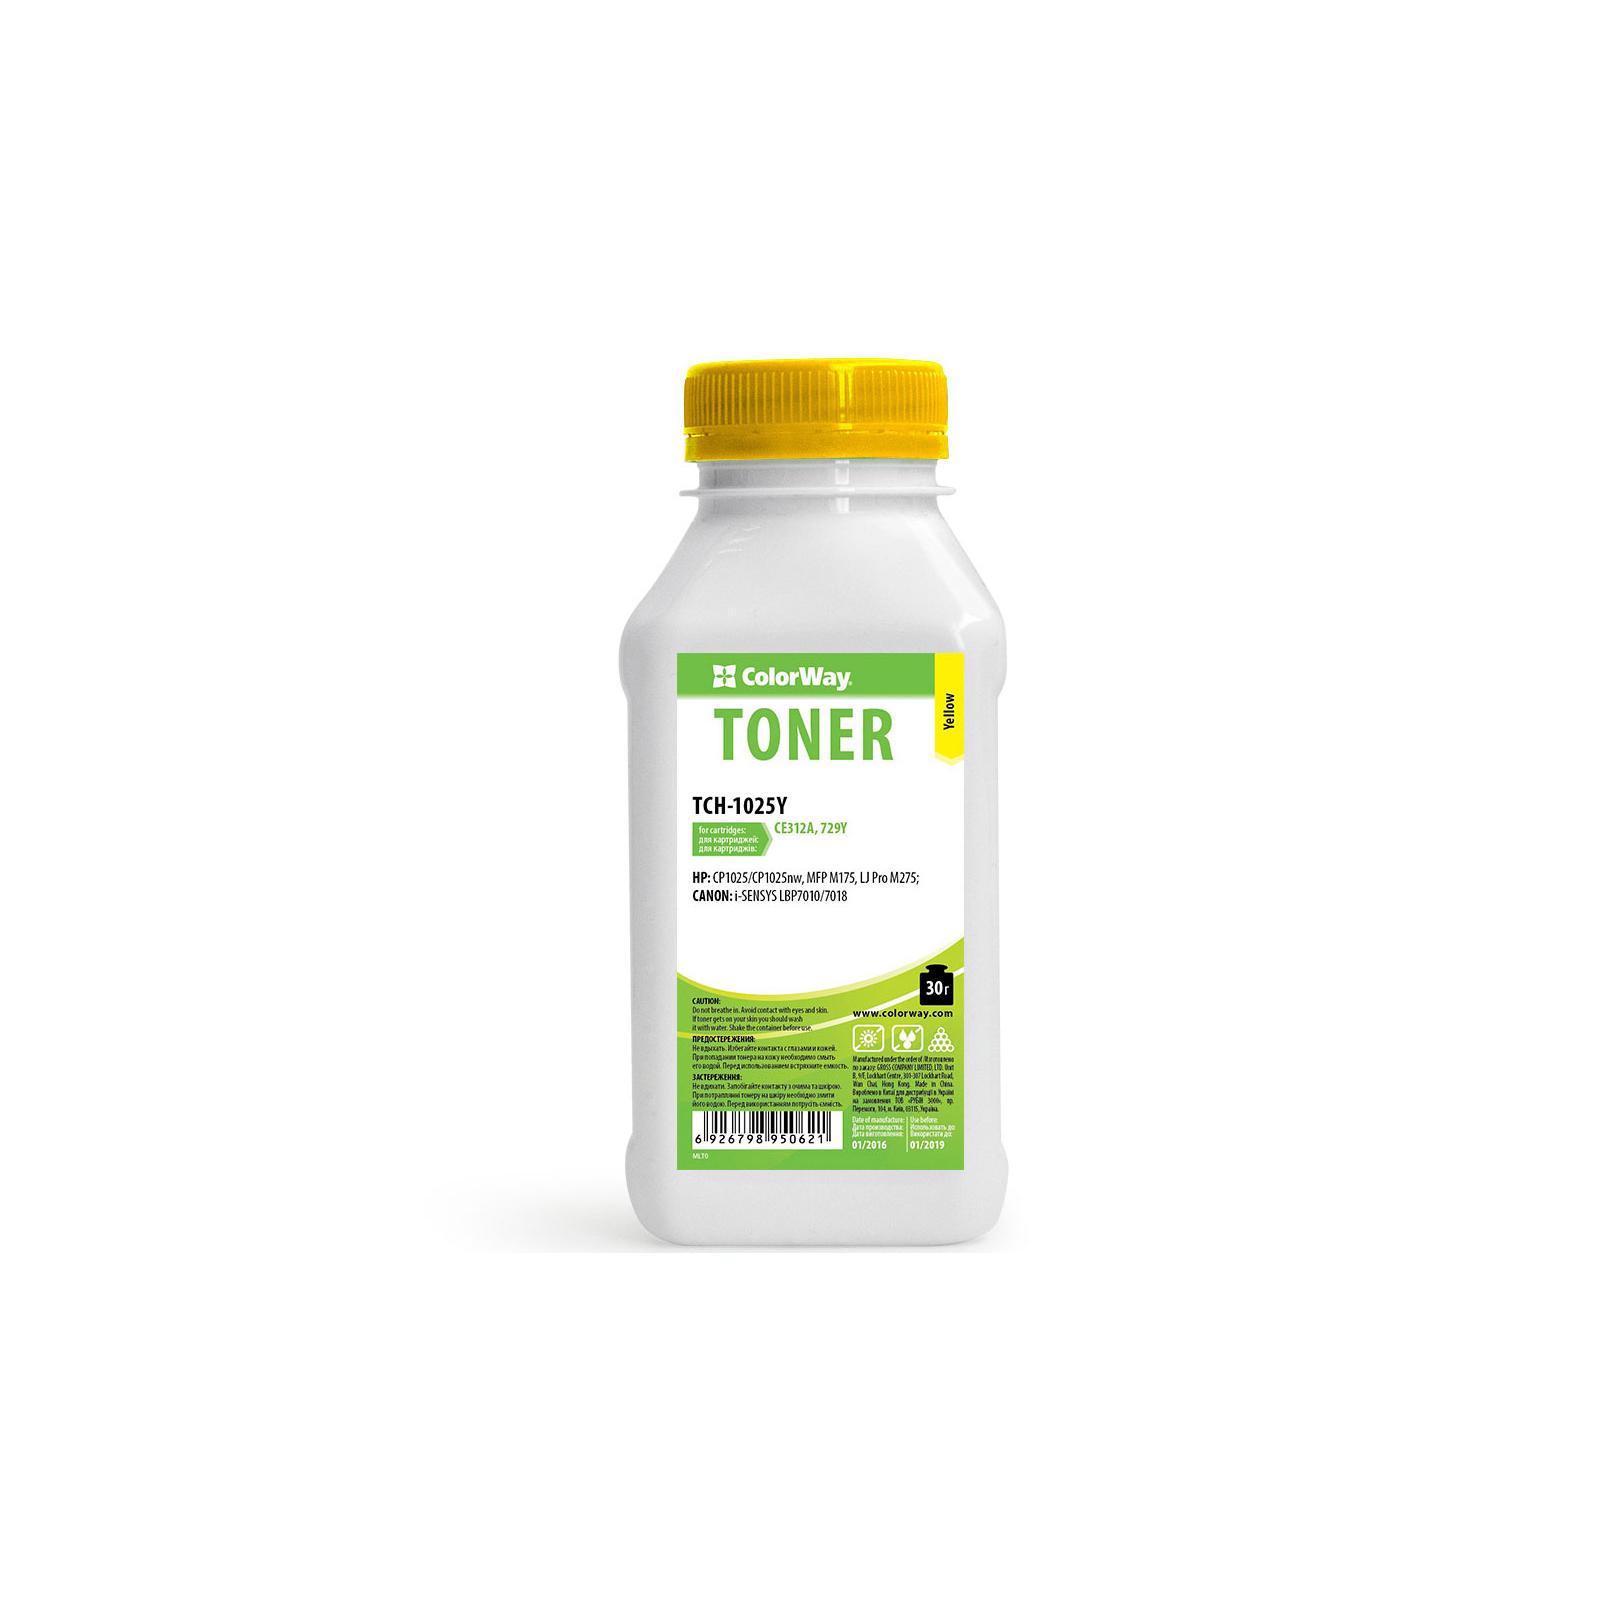 Тонер HP CLJ CP1025/Pro100/M175 Yellow 30g ColorWay (TCH-1025Y)